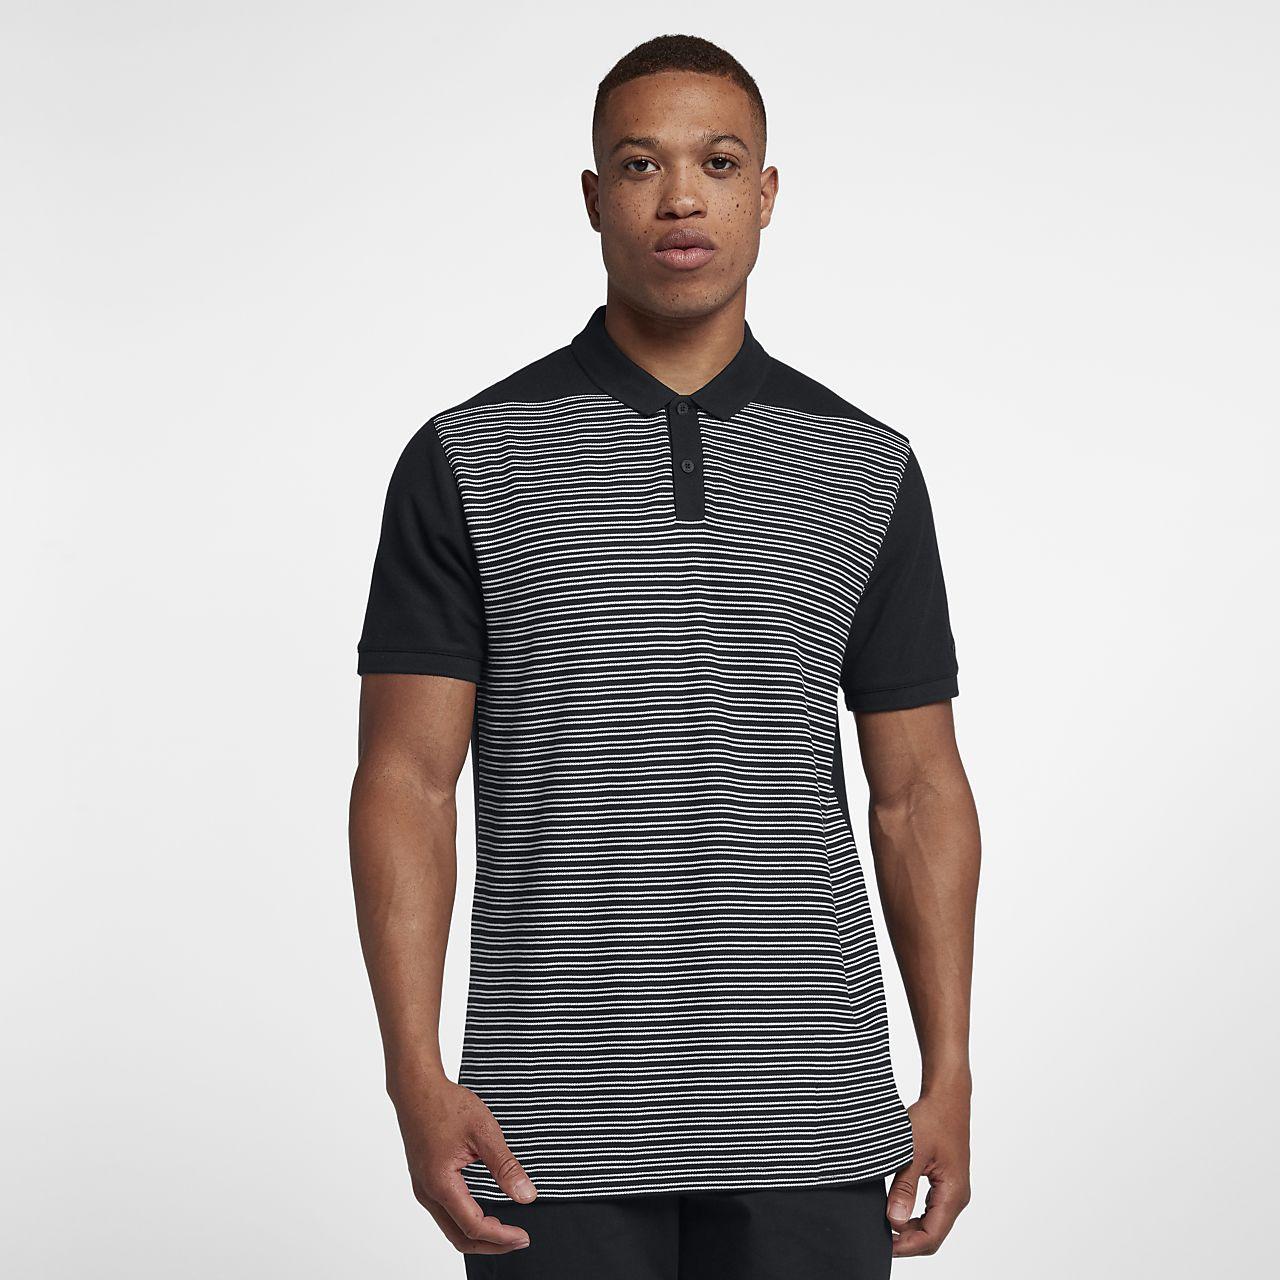 Męska koszulka polo do golfa Nike Dri-FIT